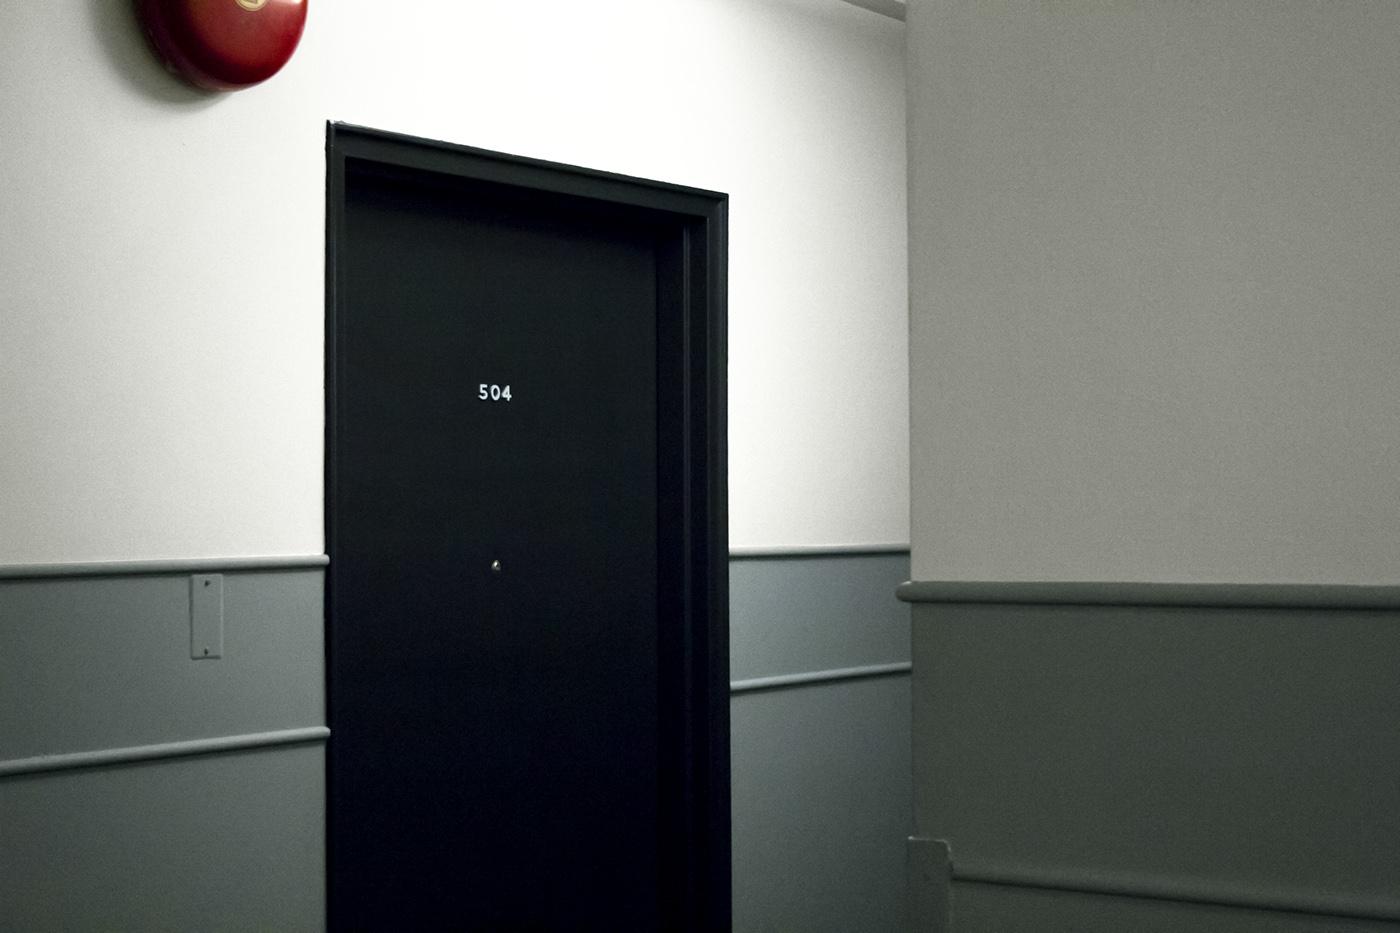 Le Petit Louis 公寓大楼标识设计 © Stéphanie Aubin